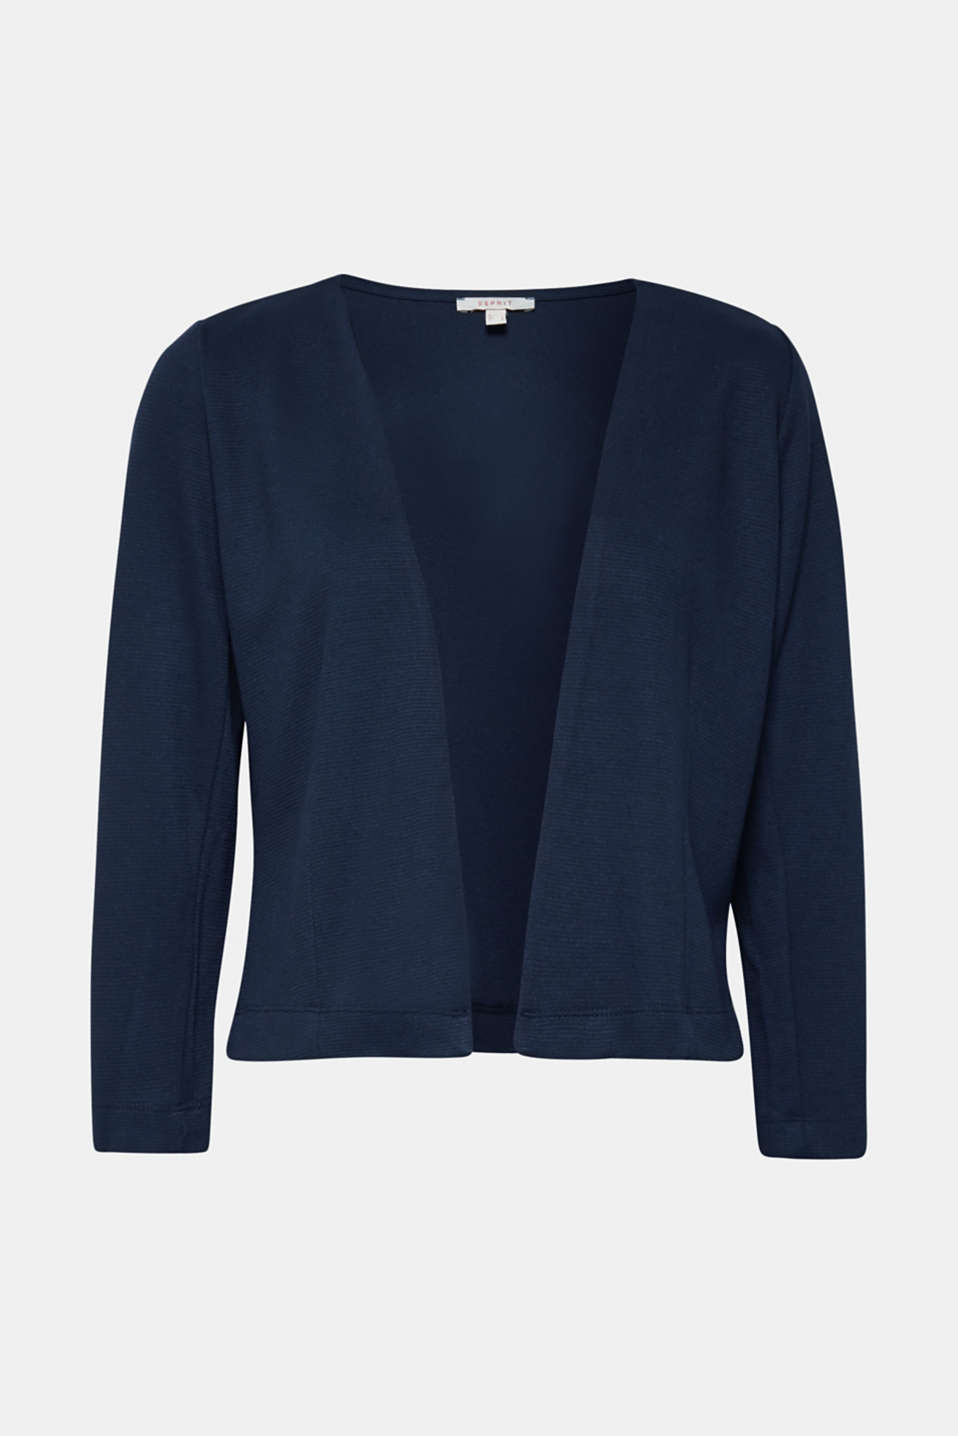 Bolero cardigan made of textured jersey, NAVY, detail image number 3